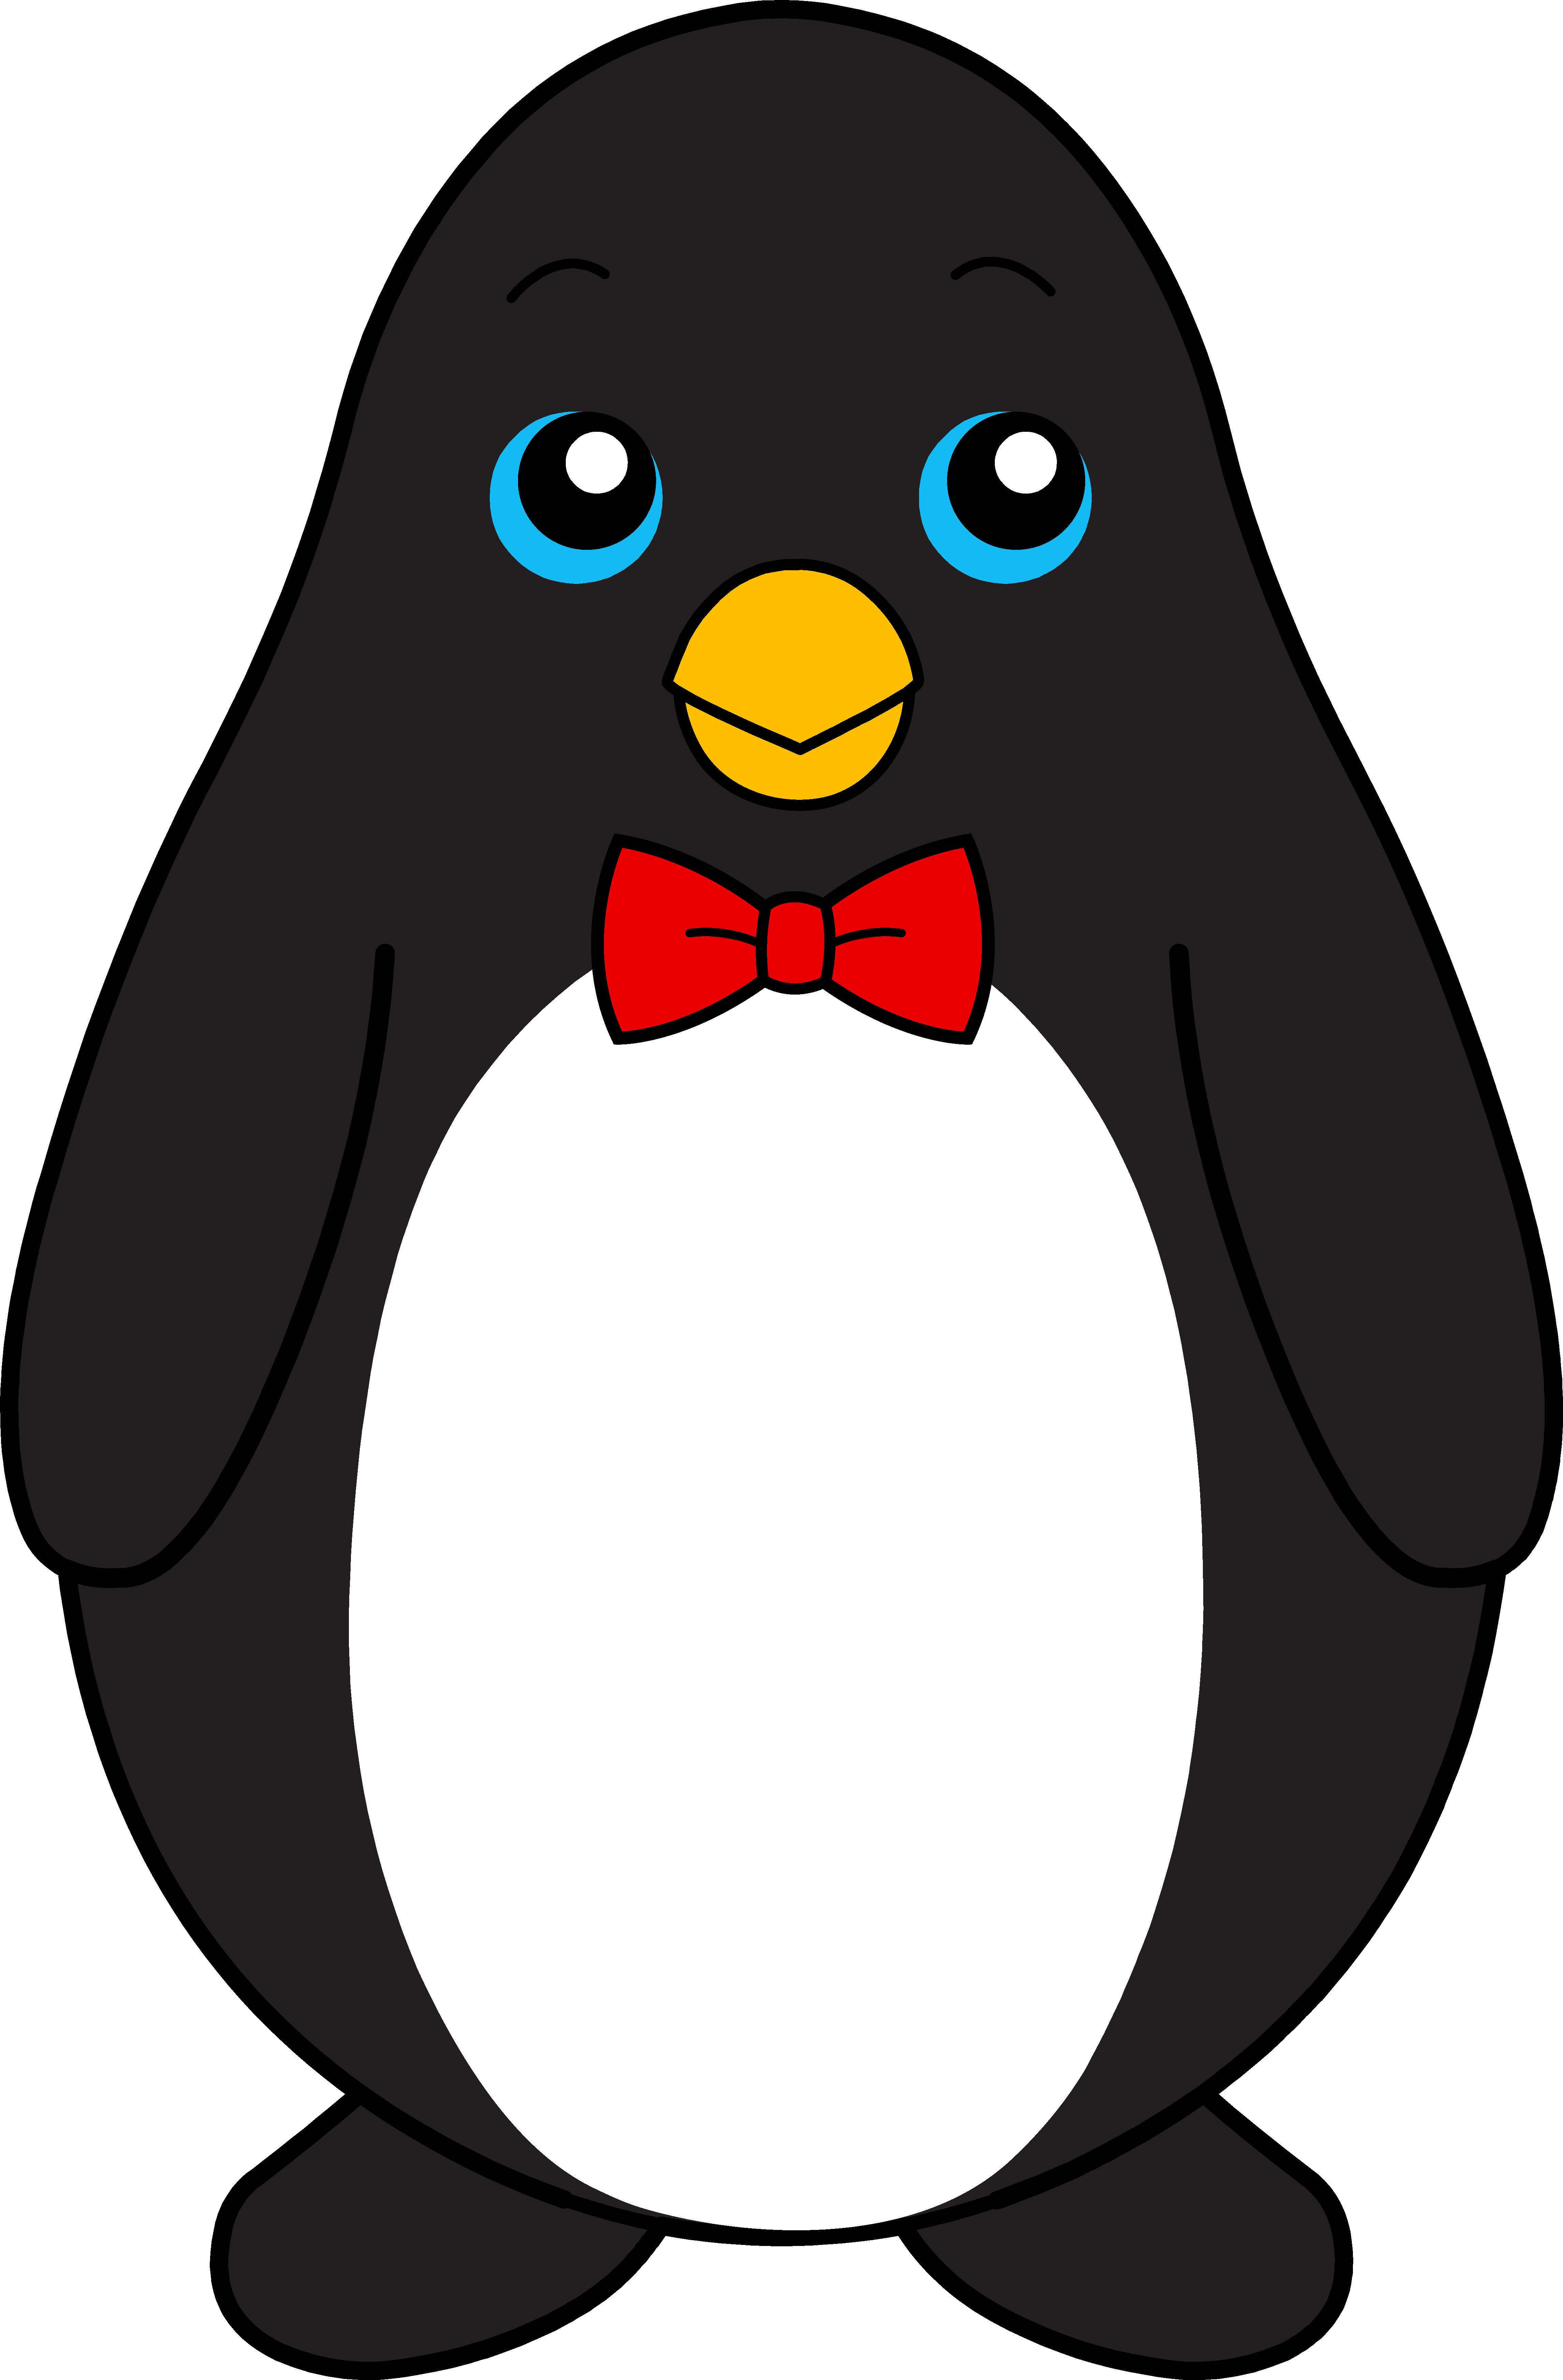 Penguin Clipart Black And White-penguin clipart black and white-10